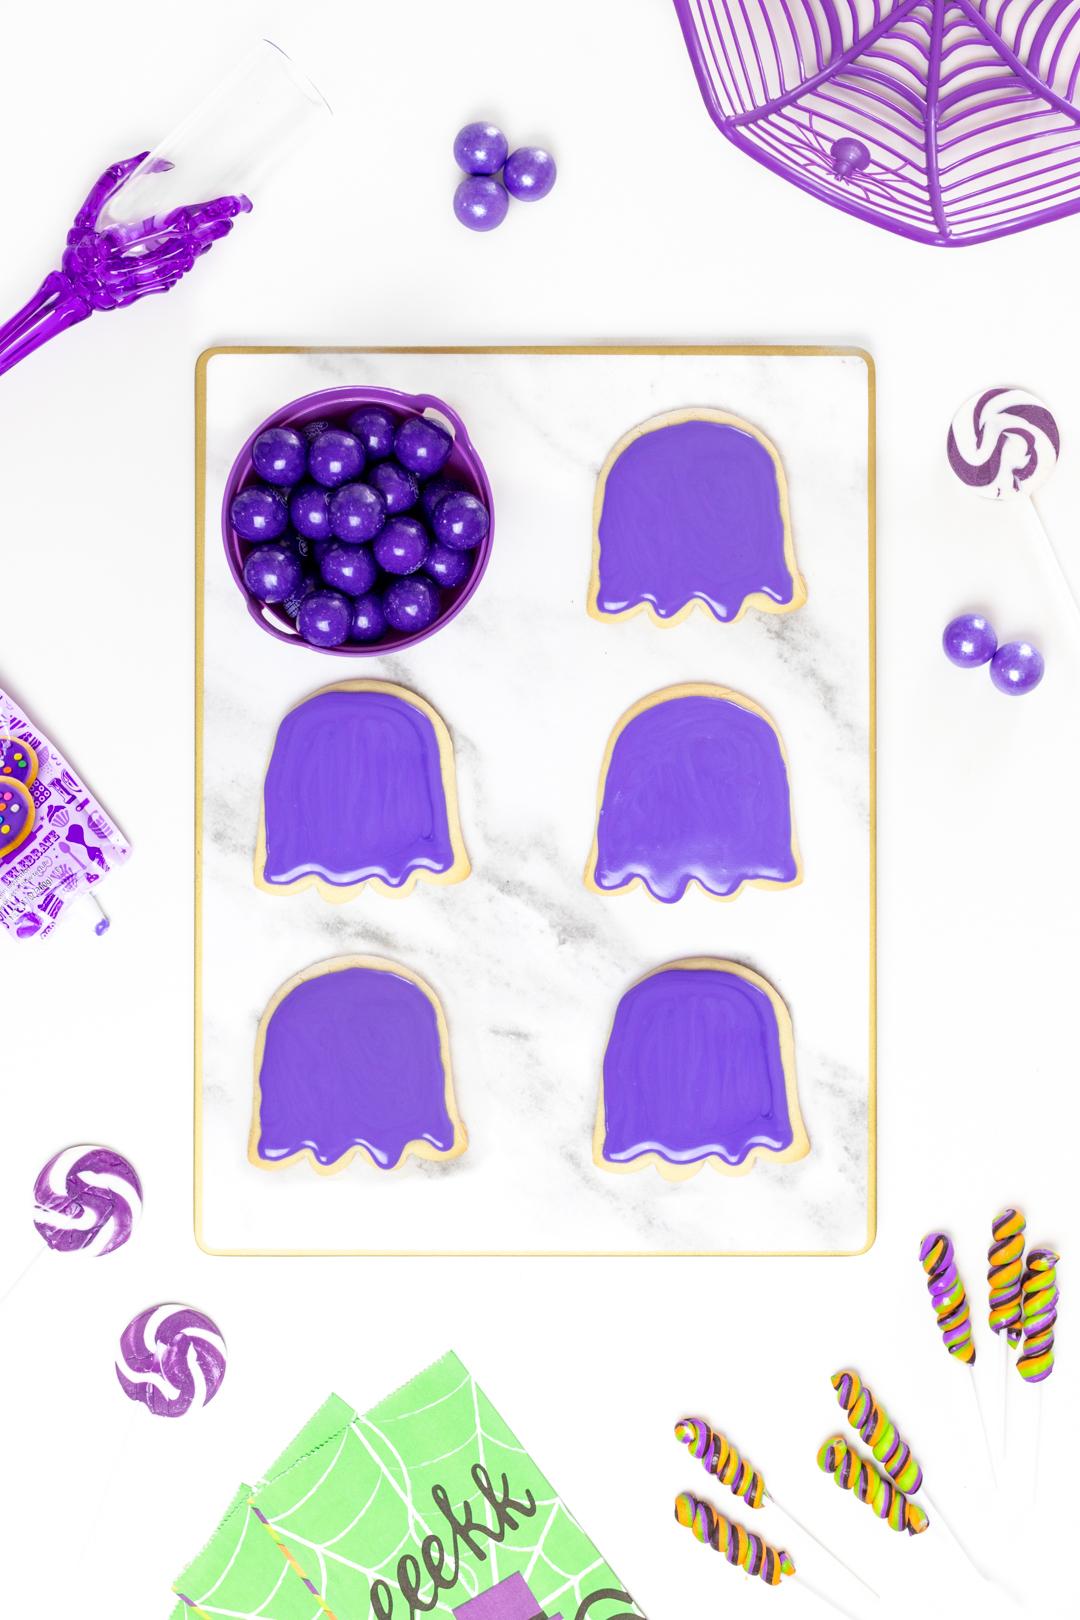 purple iced halloween cookies on a tray